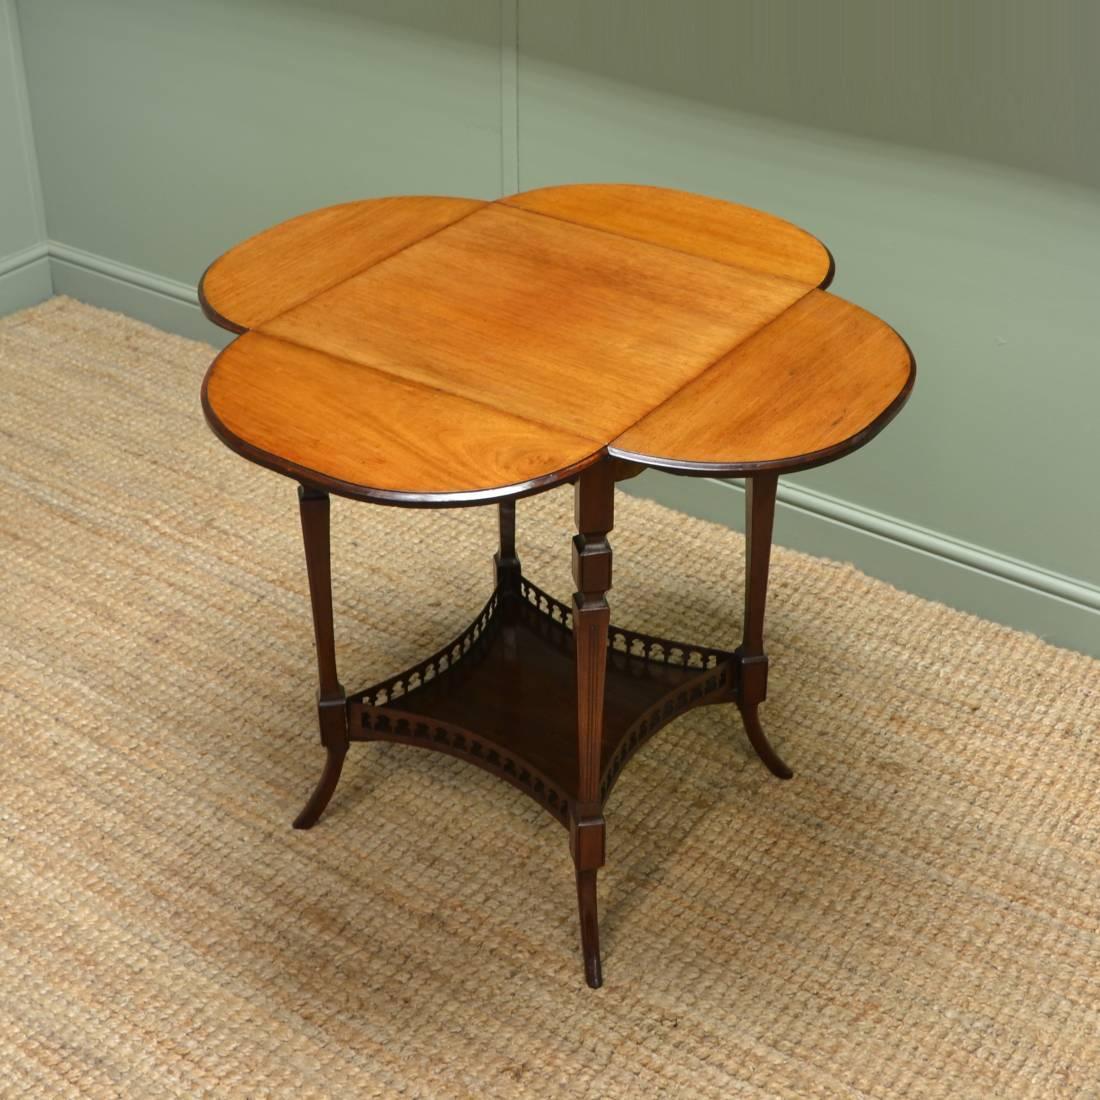 Rare Four Leaf Clover, Edwardian Mahogany Antique Occasional Table.